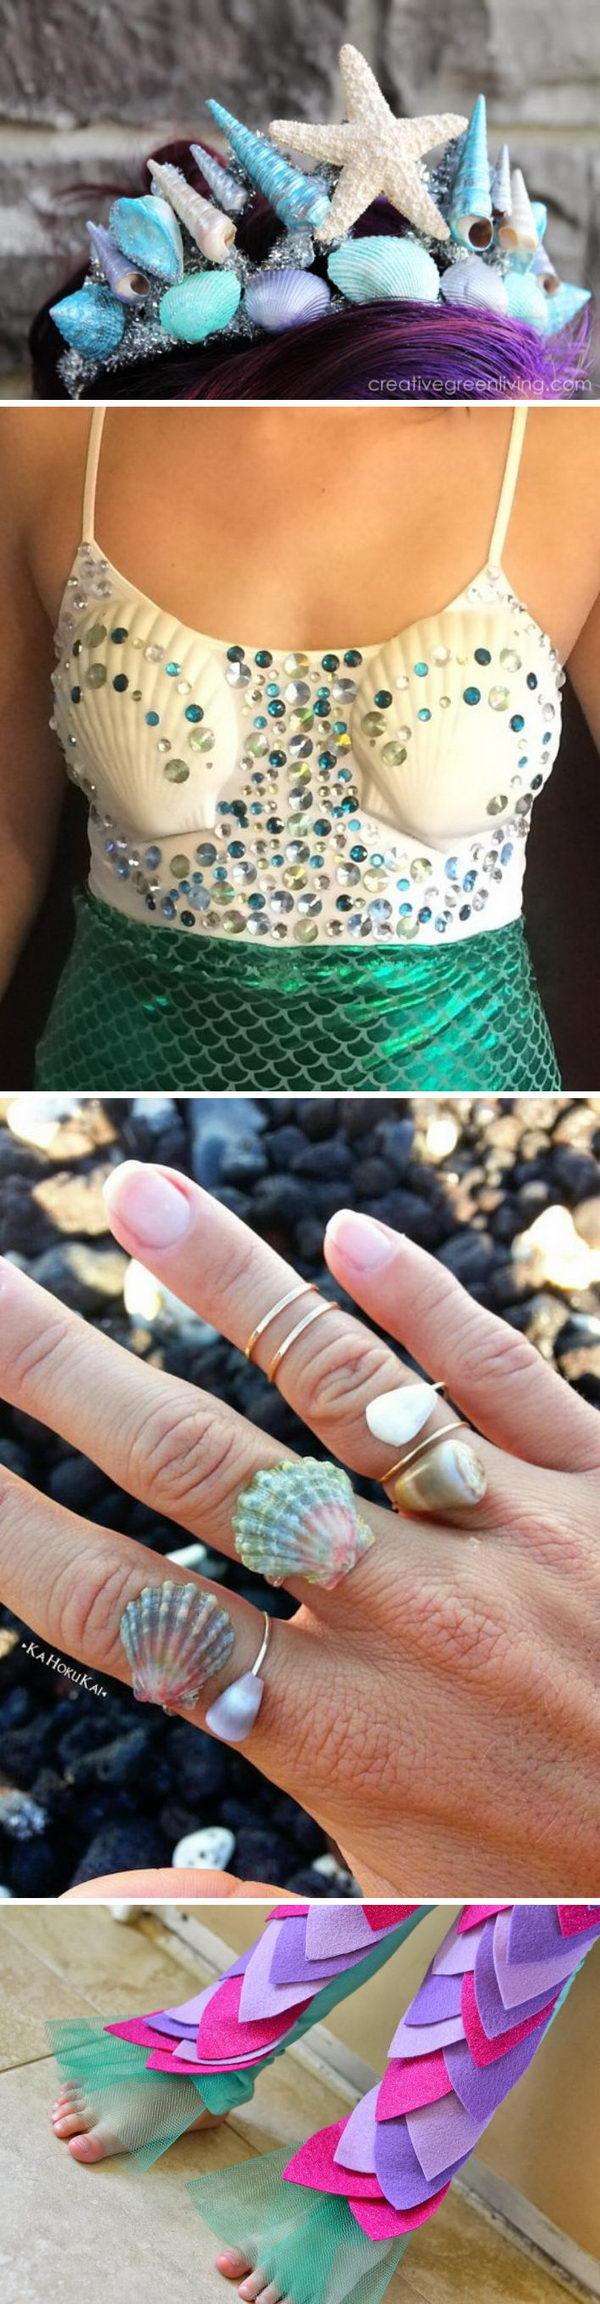 Mermaid Costumes and DIY Ideas.